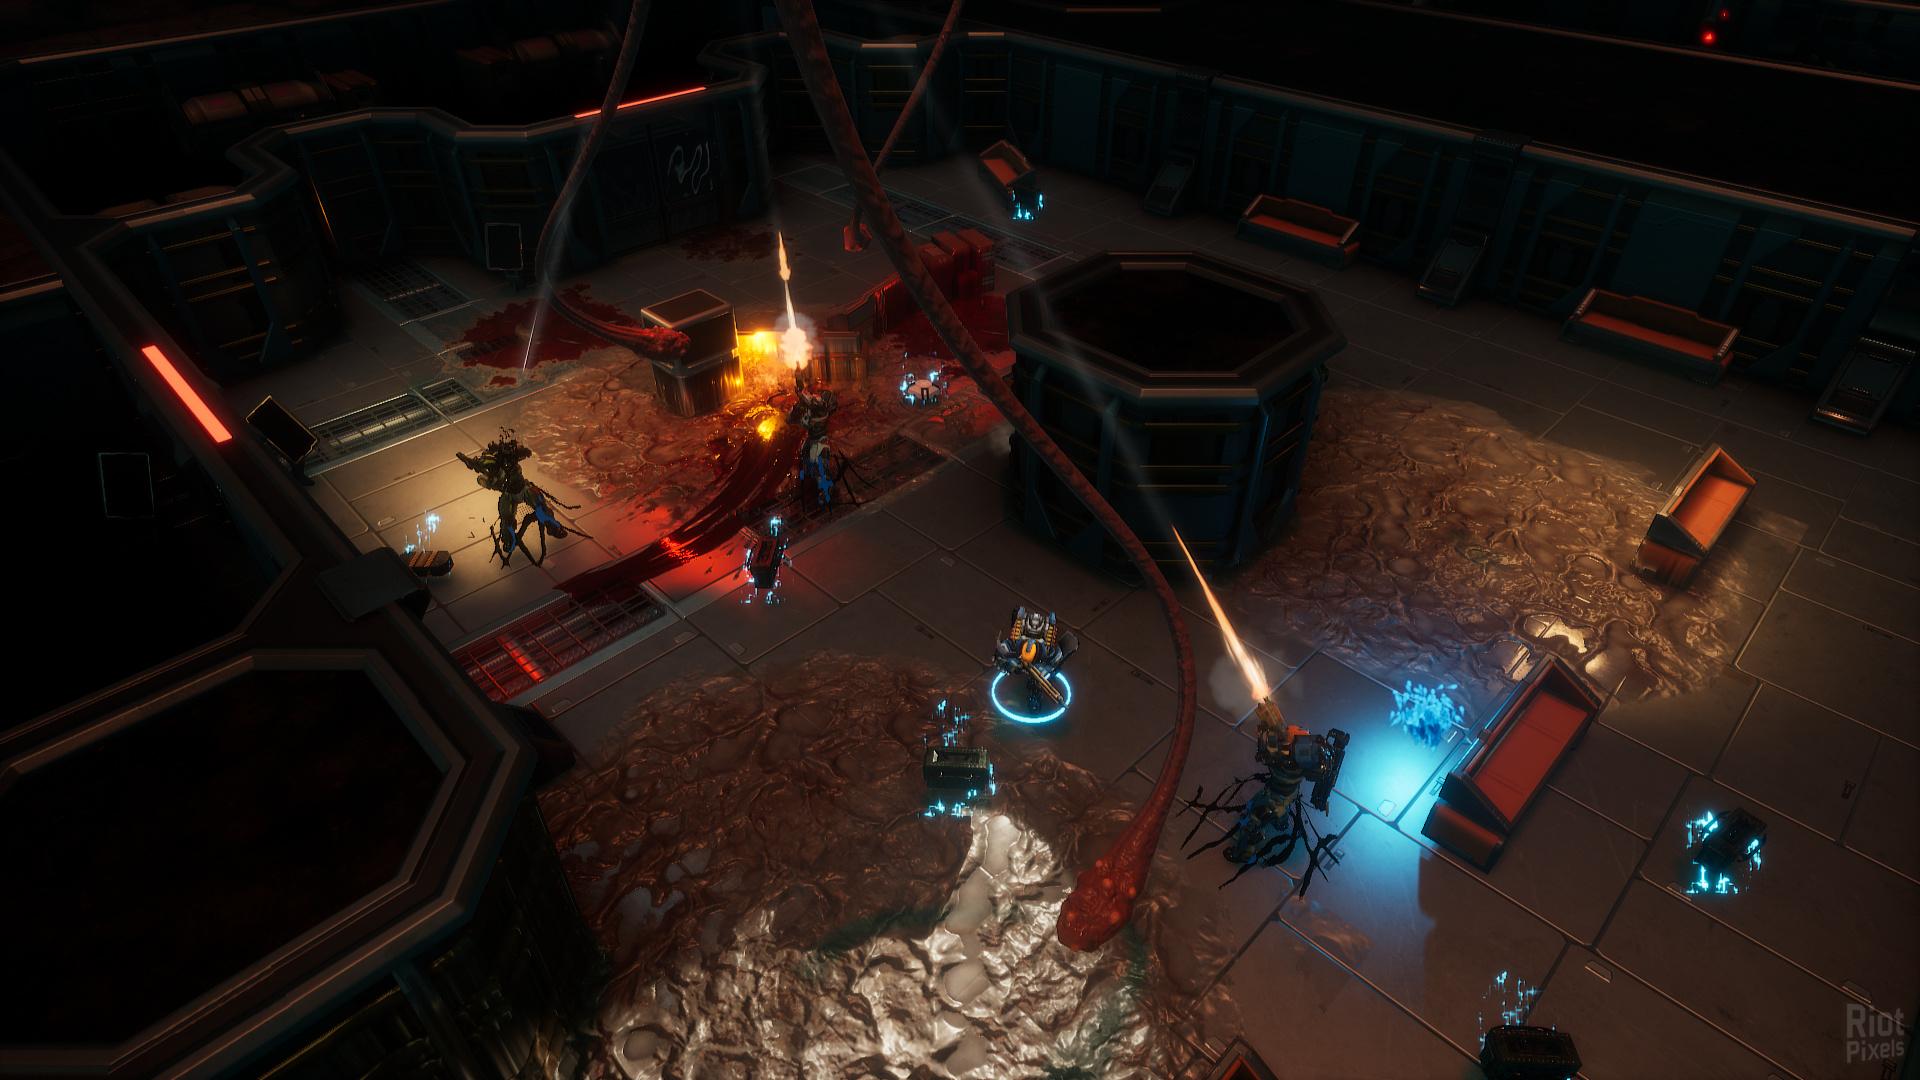 Red Solstice 2: Survivors - game screenshots at Riot Pixels, images